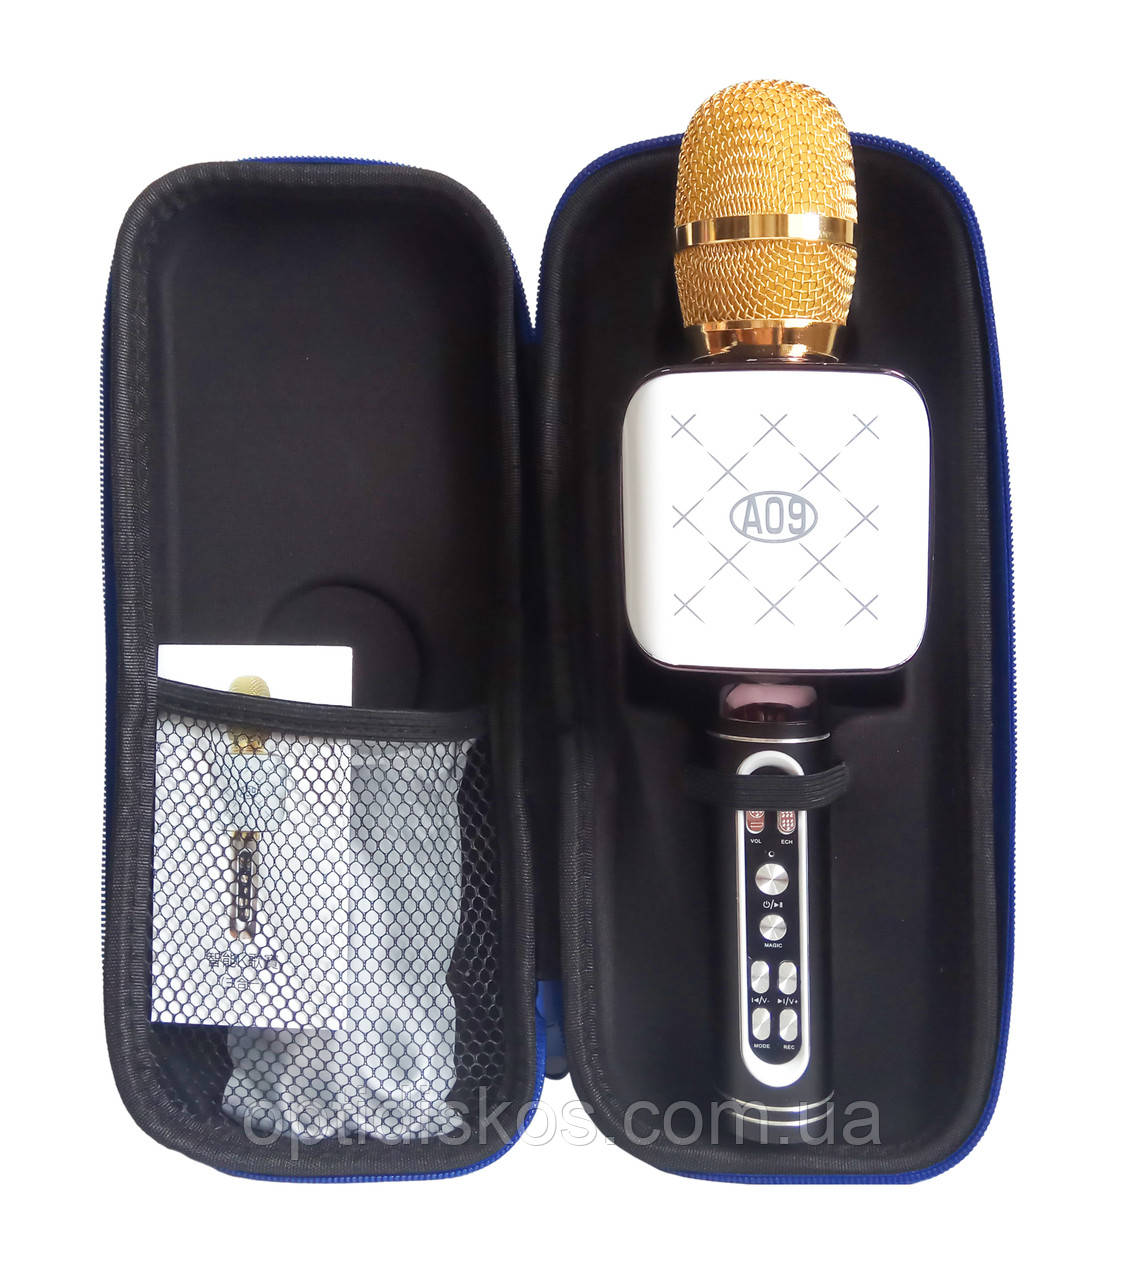 Беспроводной караоке микрофон - колонка A09 с футляром(фонограмма, запись, USB, microSD, AUX, FM, Bluetooth)